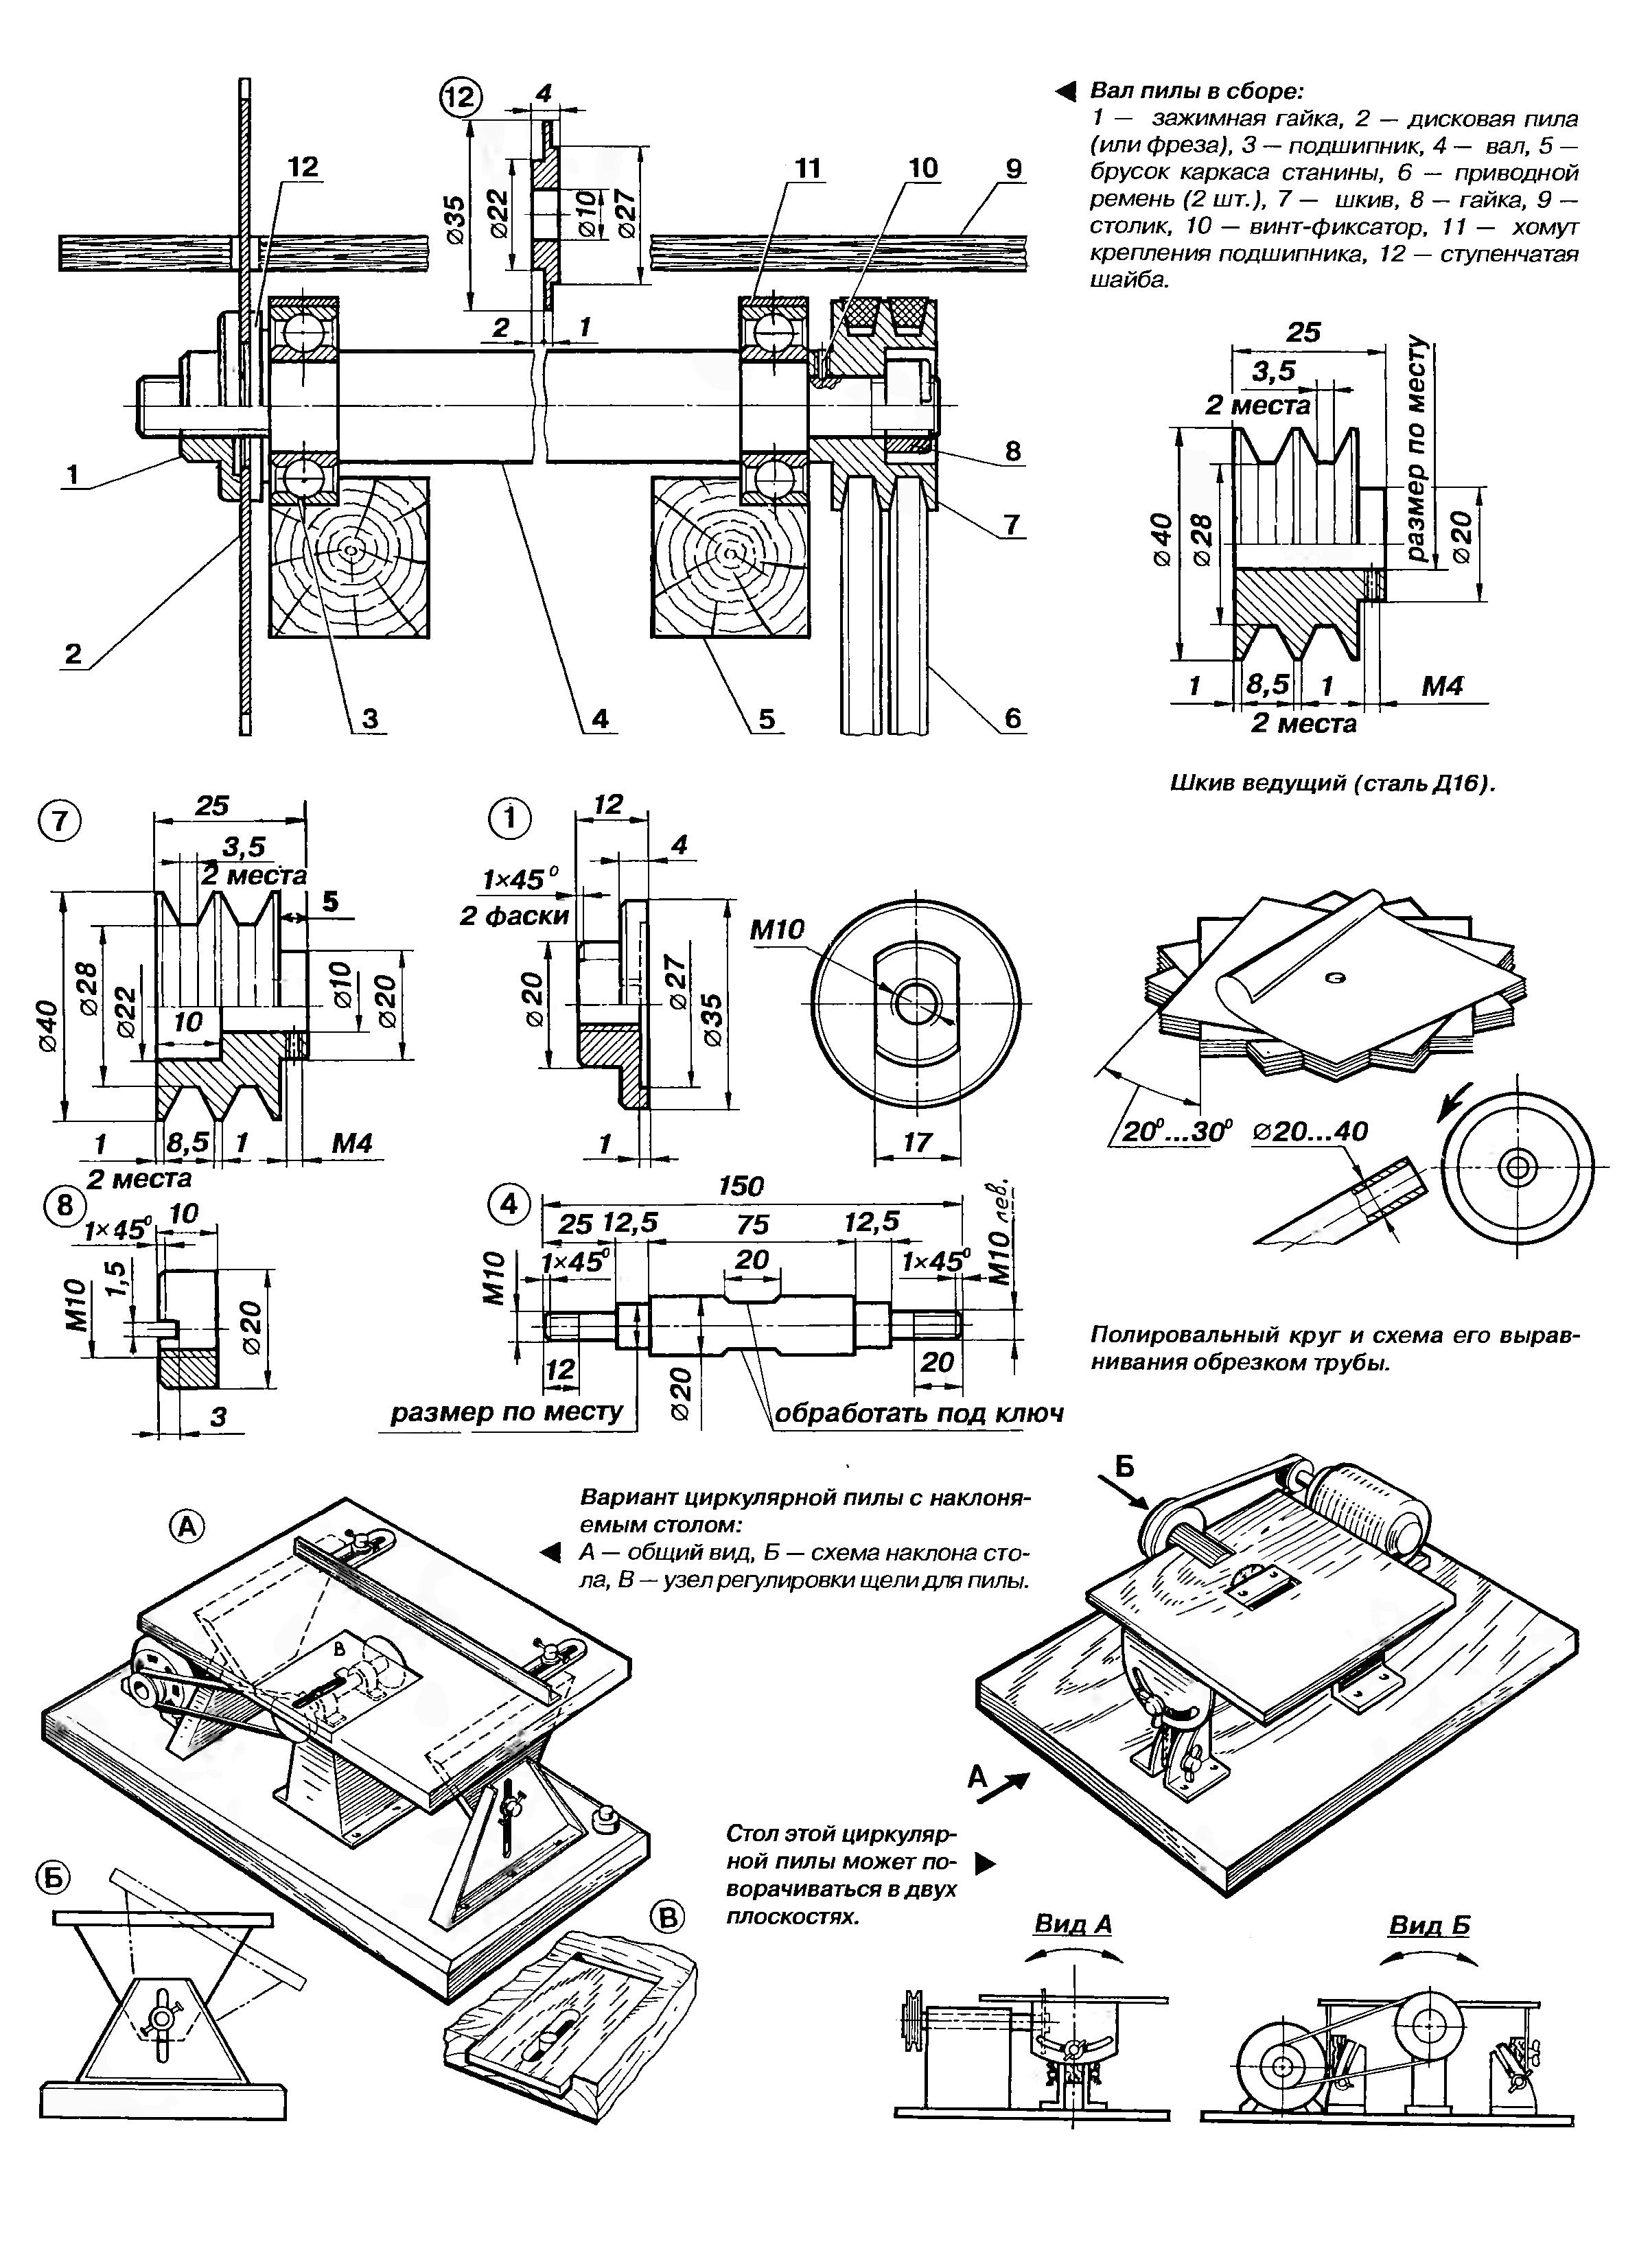 Циркулярный стол своими руками чертеж 797